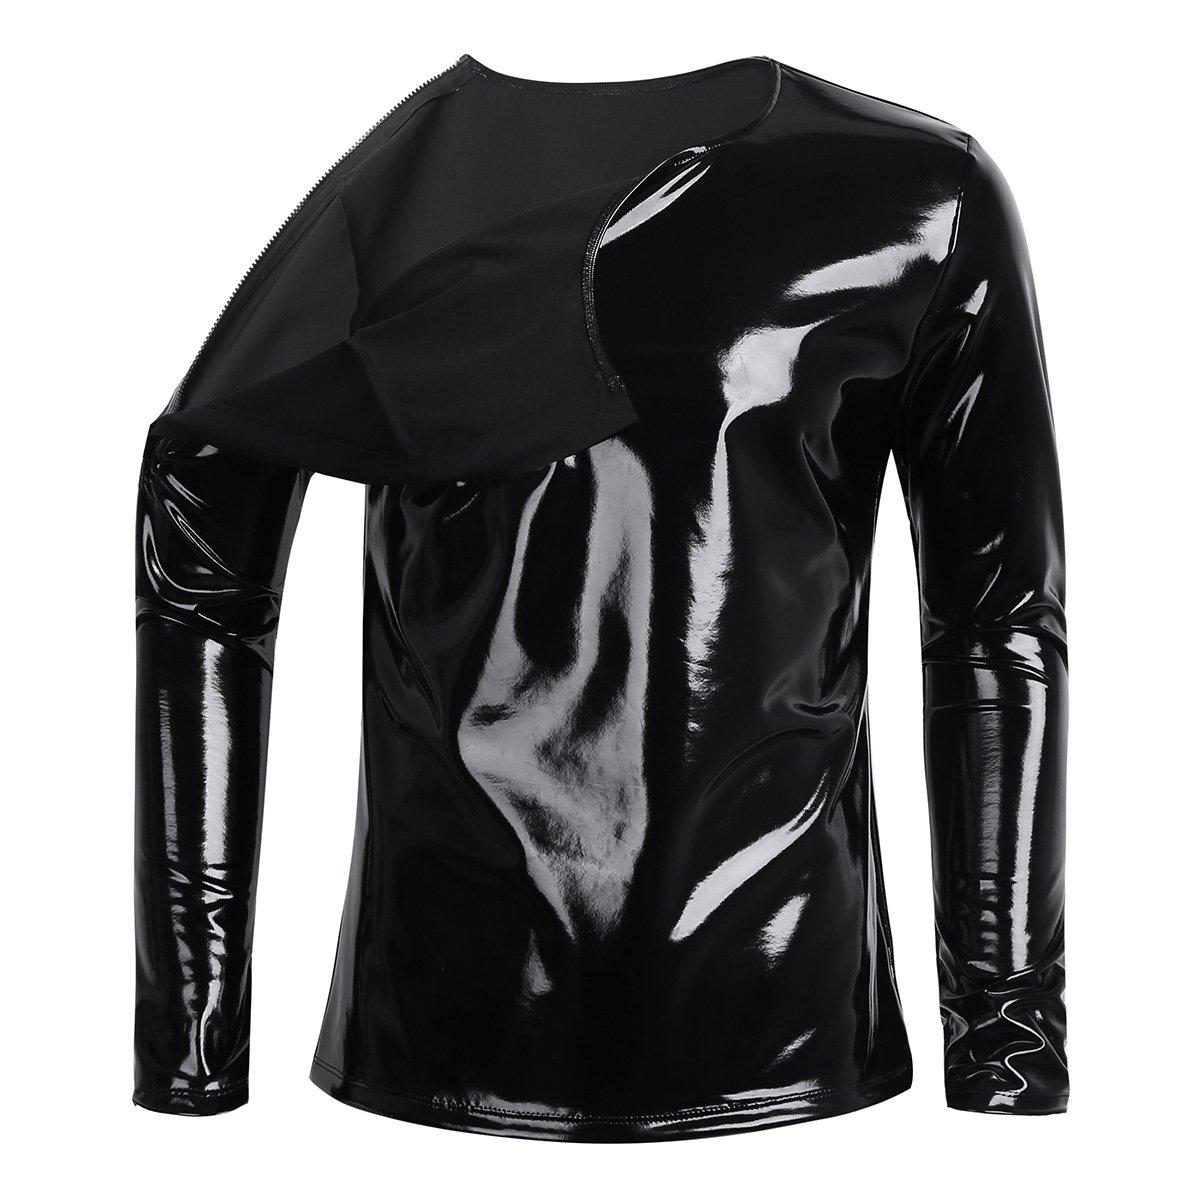 TiaoBug Mens Sexy Shiny Patent Leather Long Sleeve Zipper Metallic T-Shirt at Amazon Mens Clothing store: